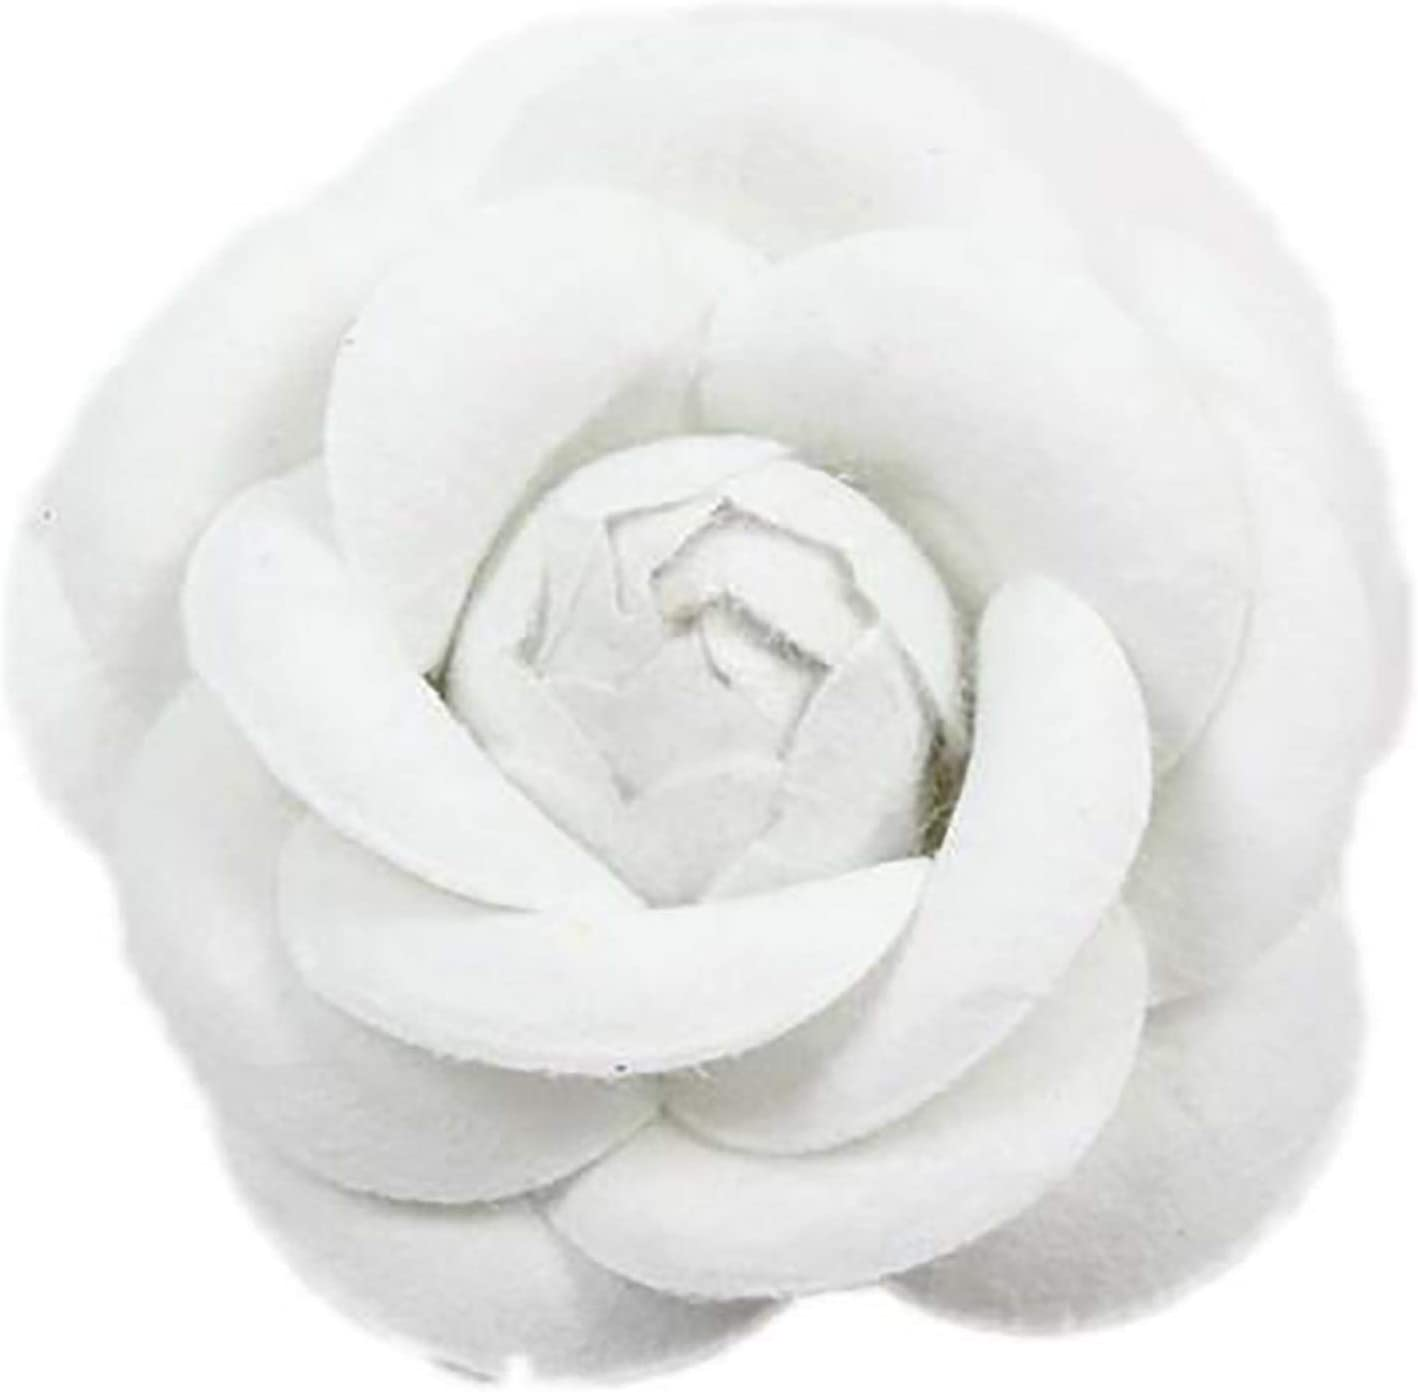 MOONRING Women's Pastel Camellia Flower Pin Brooch for Women and Girls,White